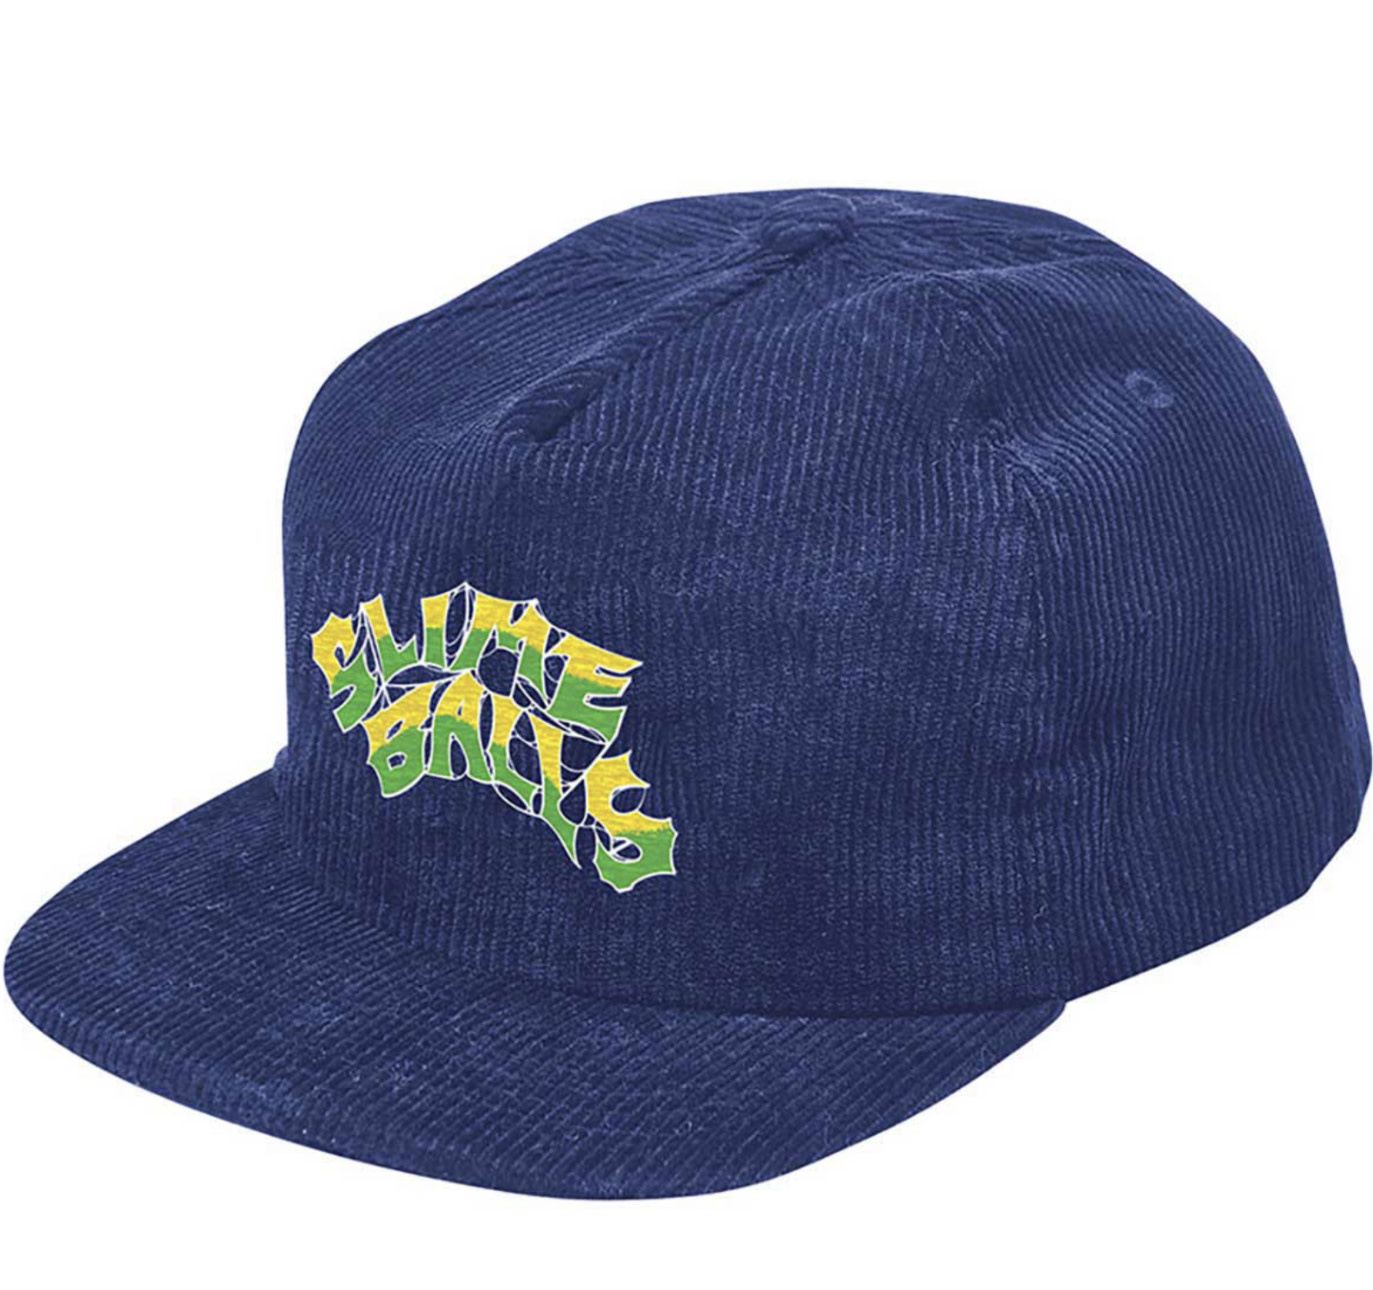 Slime Balls Slime Ball - Slime Web Snapback Blue